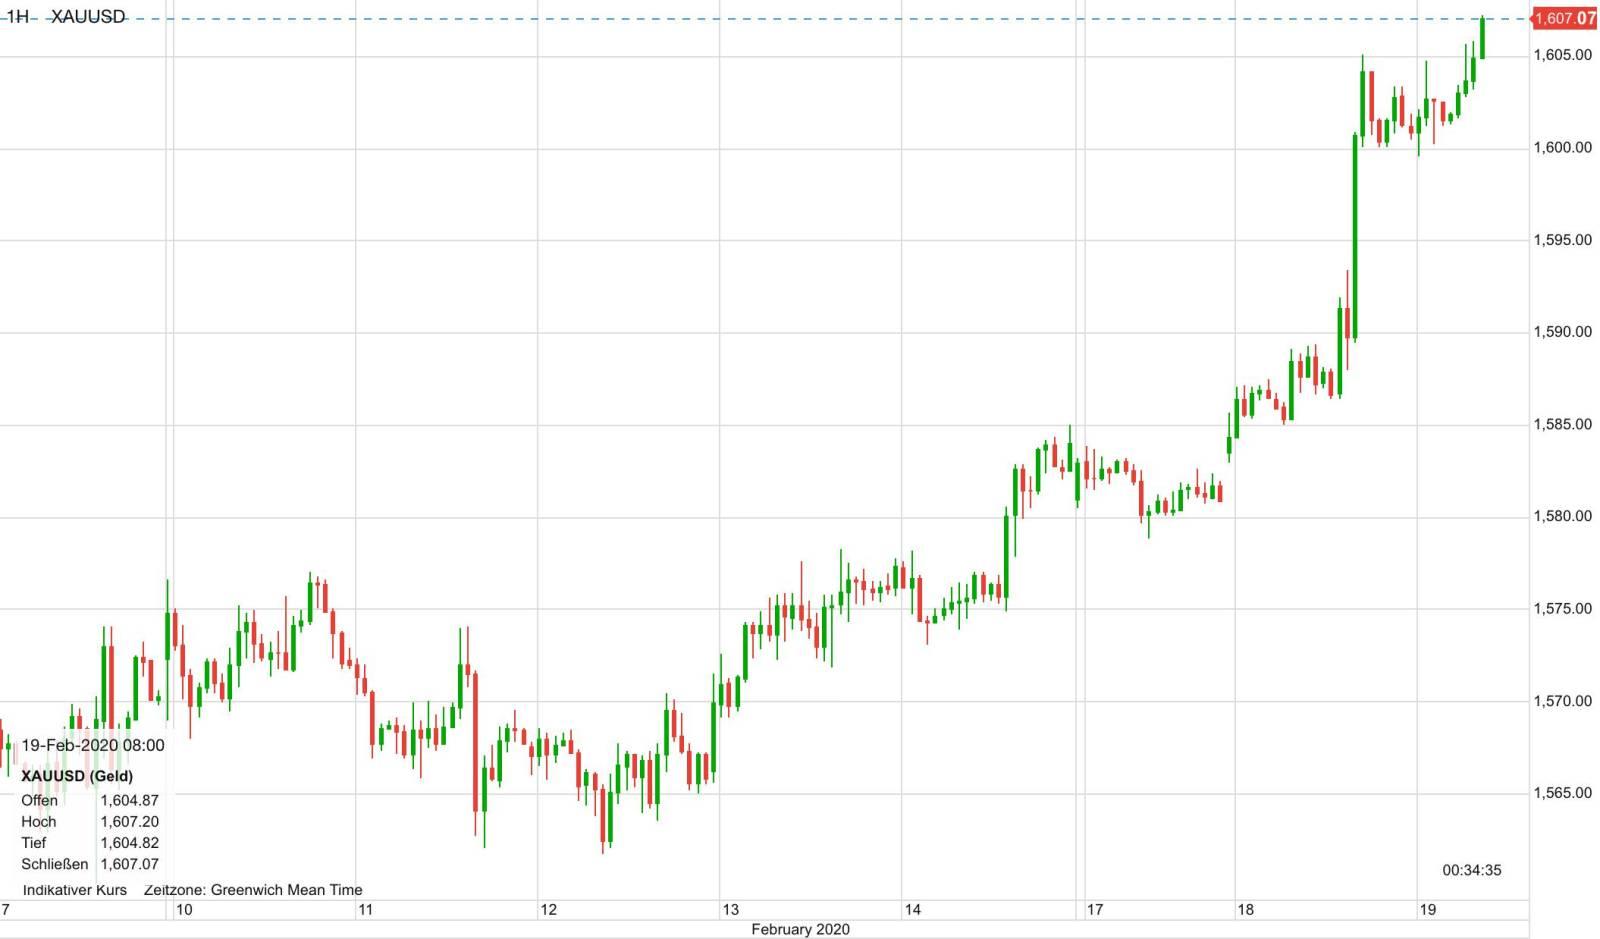 Goldpreis Verlauf seit dem 7. Februar